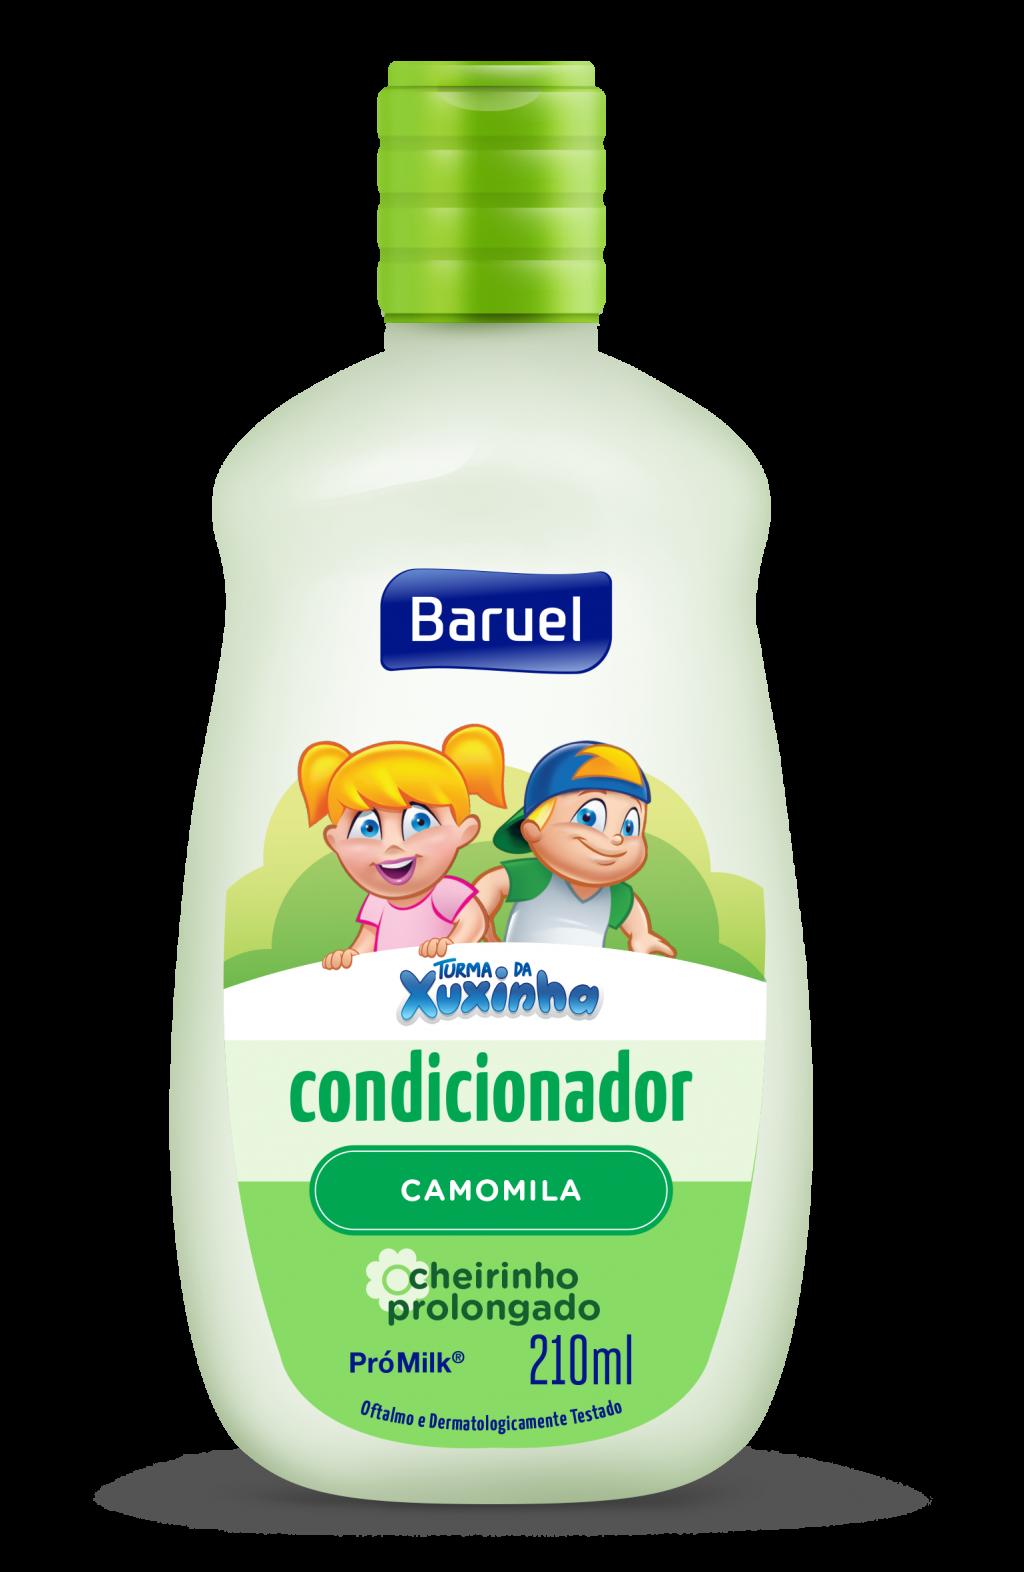 CONDICIONADOR CAMOMILA